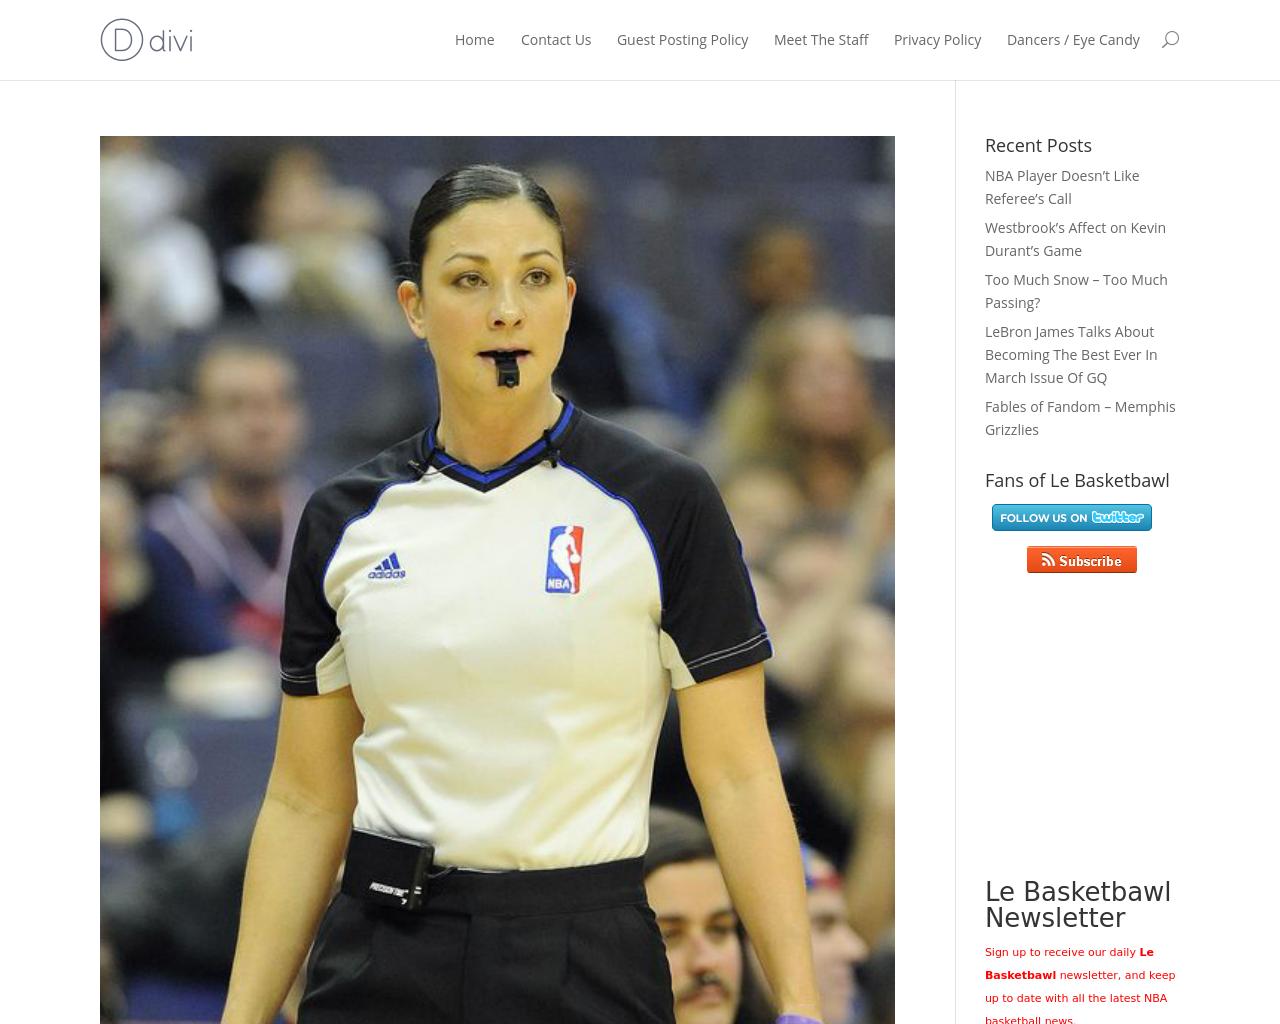 Le-Basketbawl-Advertising-Reviews-Pricing